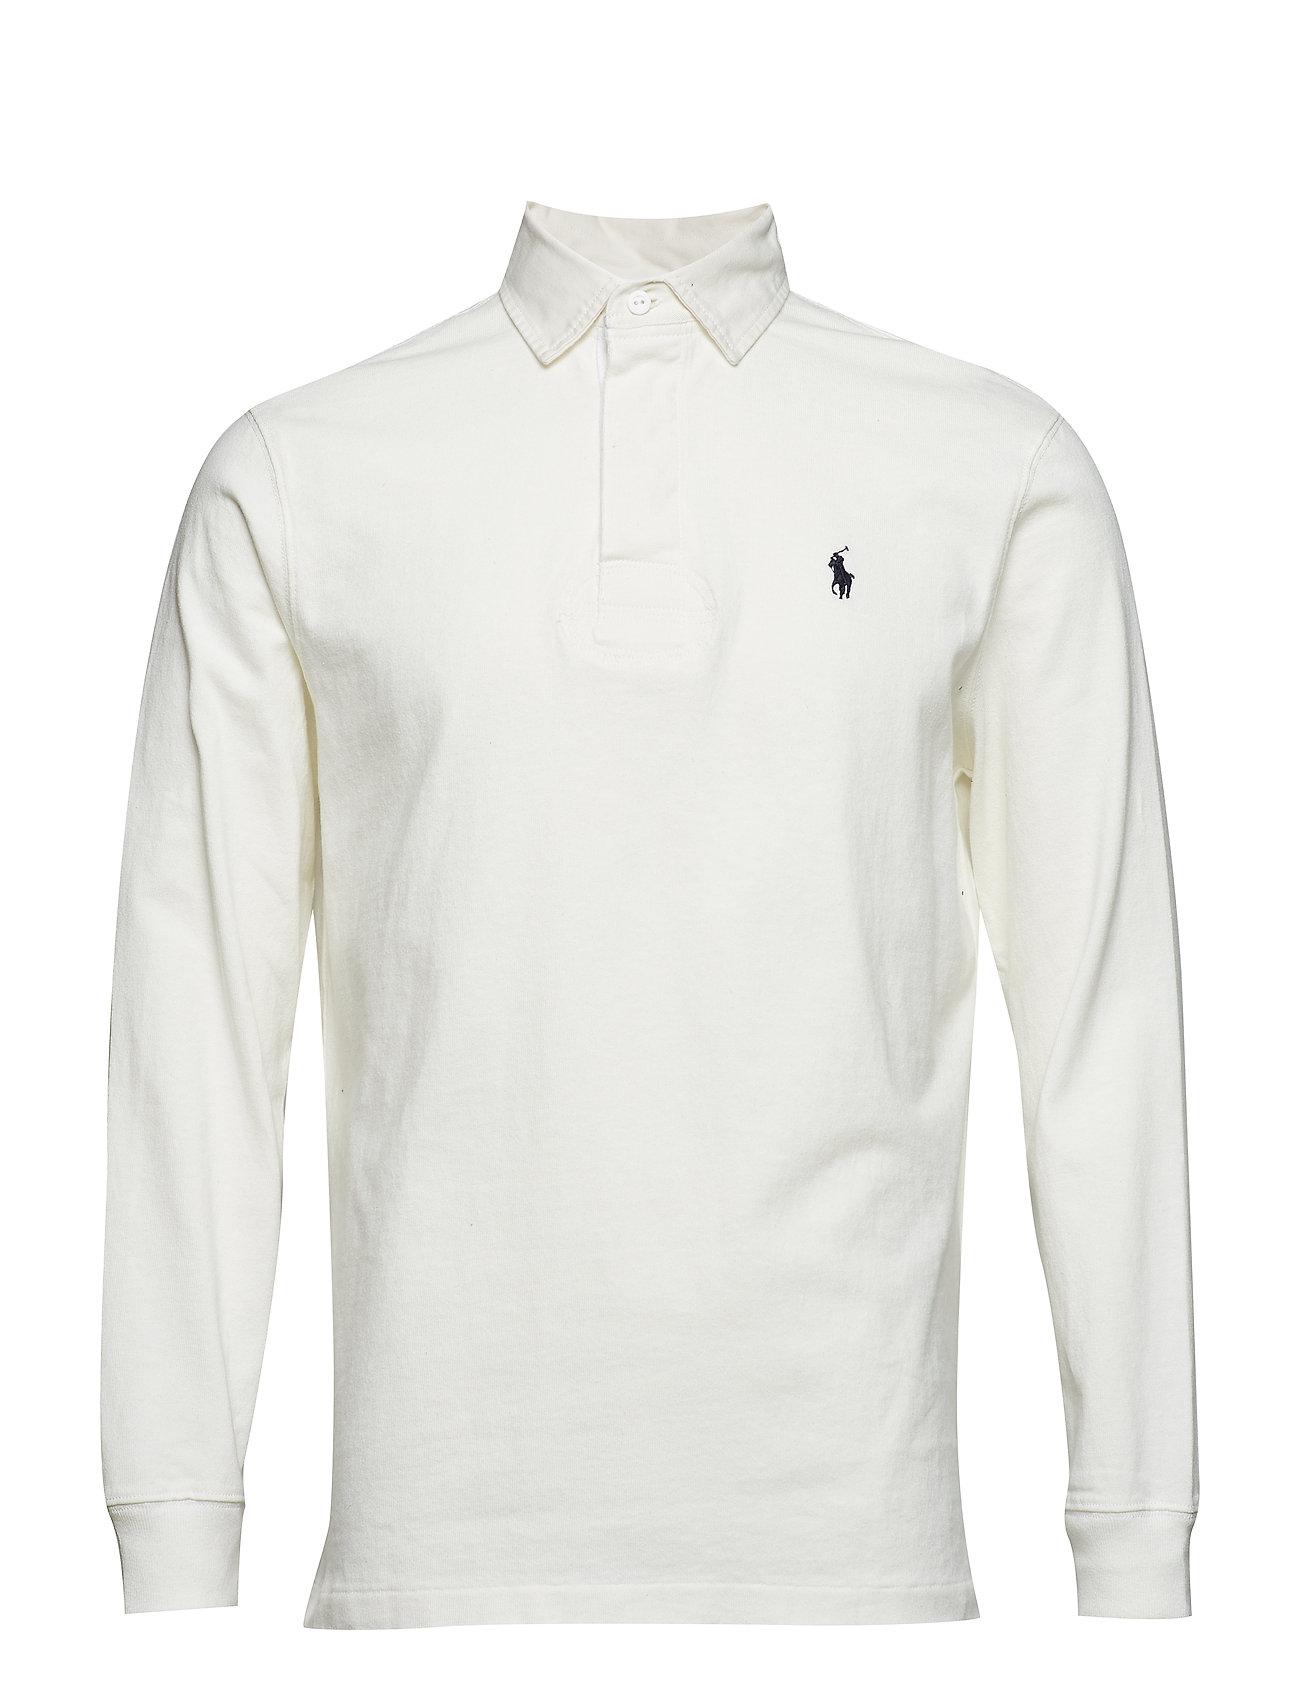 b46e95881b1e The Iconic Rugby Shirt (Deckwash White) (£81.25) - Polo Ralph Lauren ...